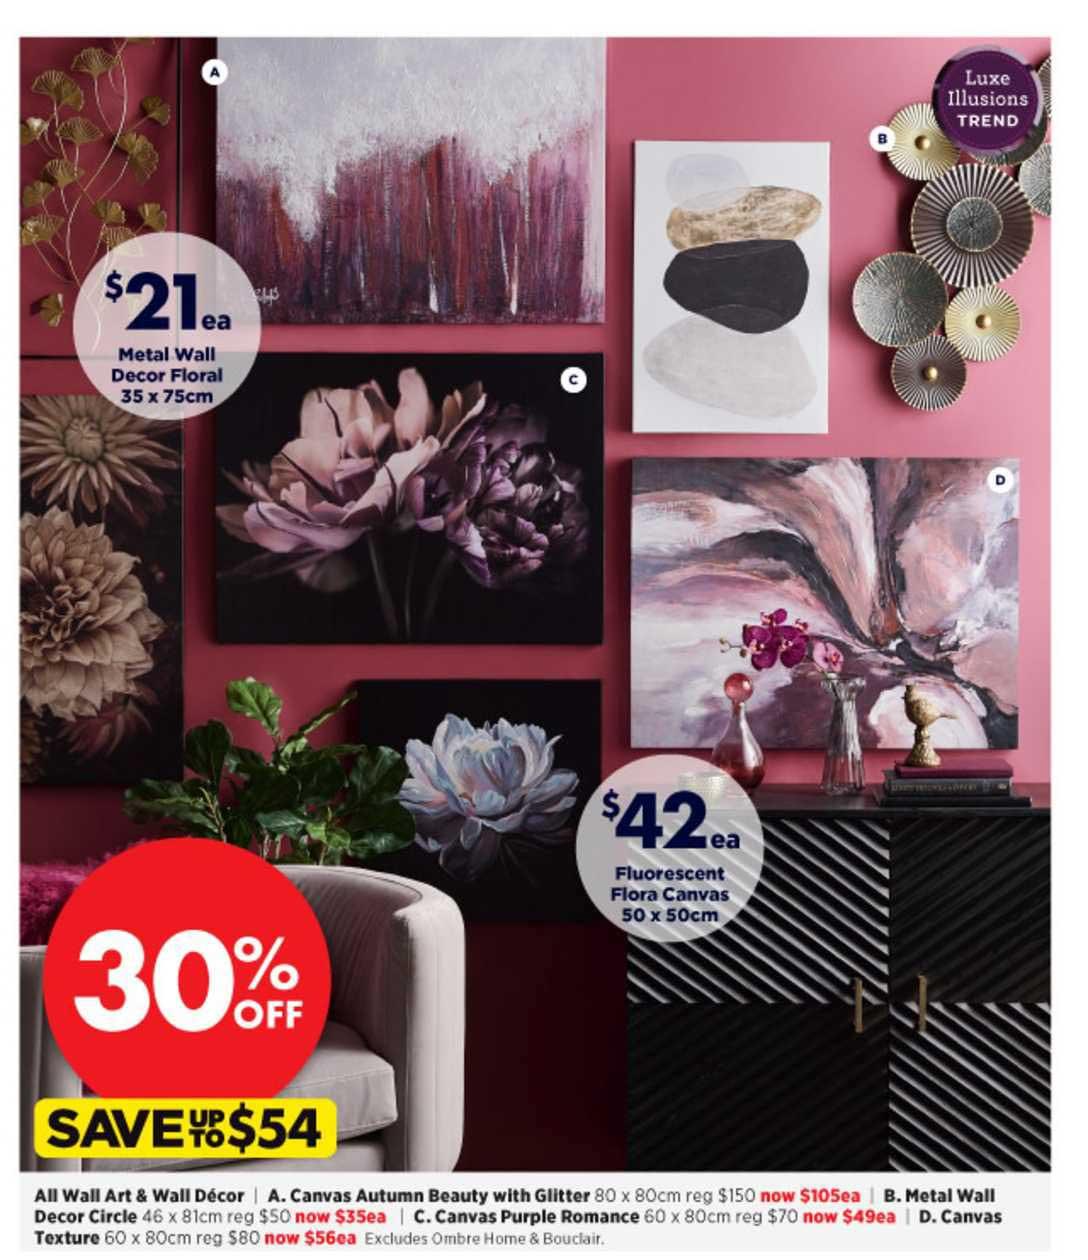 Spotlight Metal Wall Decor Floral 35 X 75 Cm , Fluorescent Flora Canvas 50 X 50cm